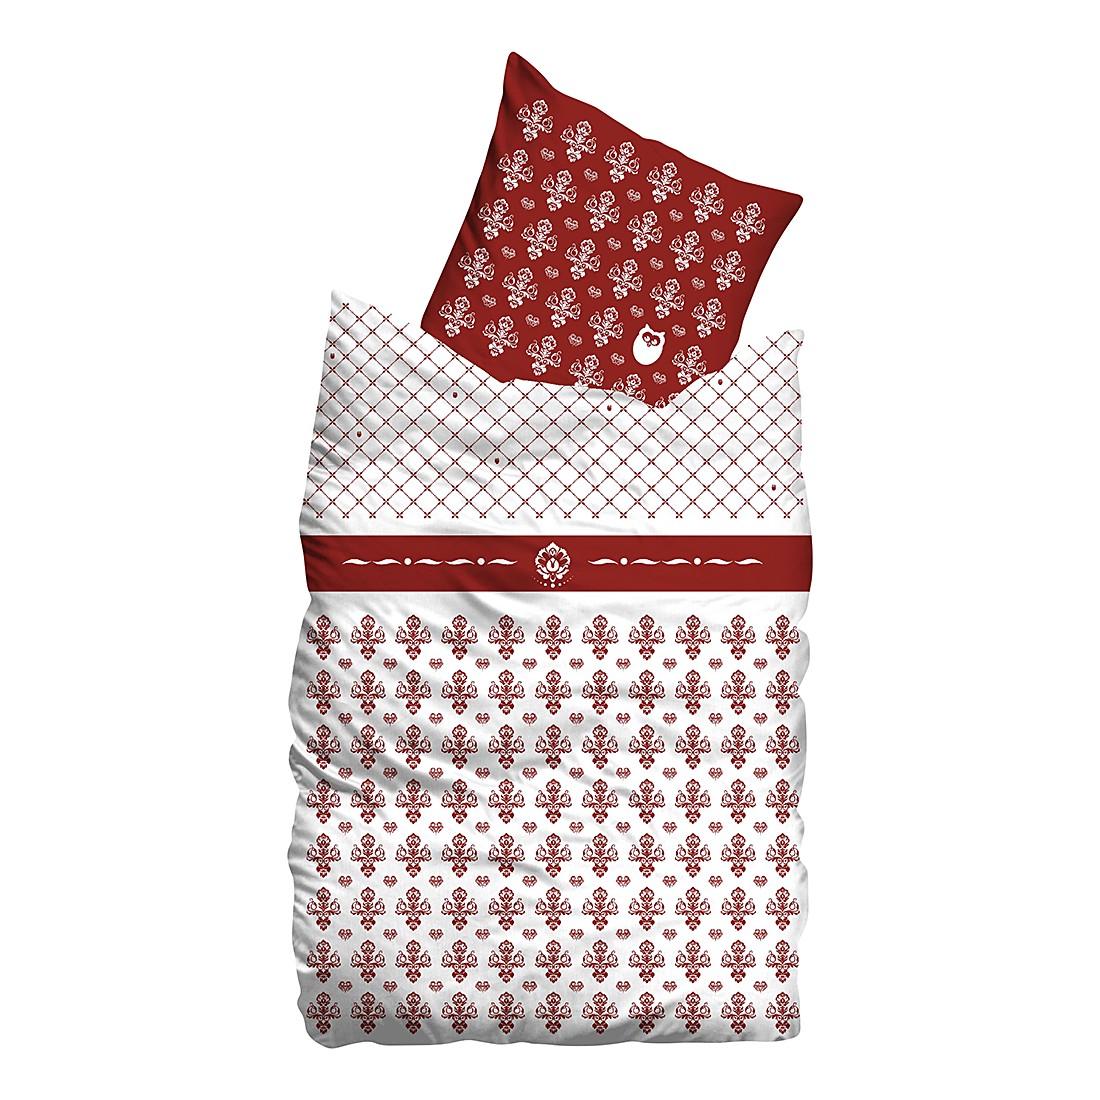 Linnen beddengoed Flourish - Wit/rood - 155x220cm + kussen 80x80cm, Suenos